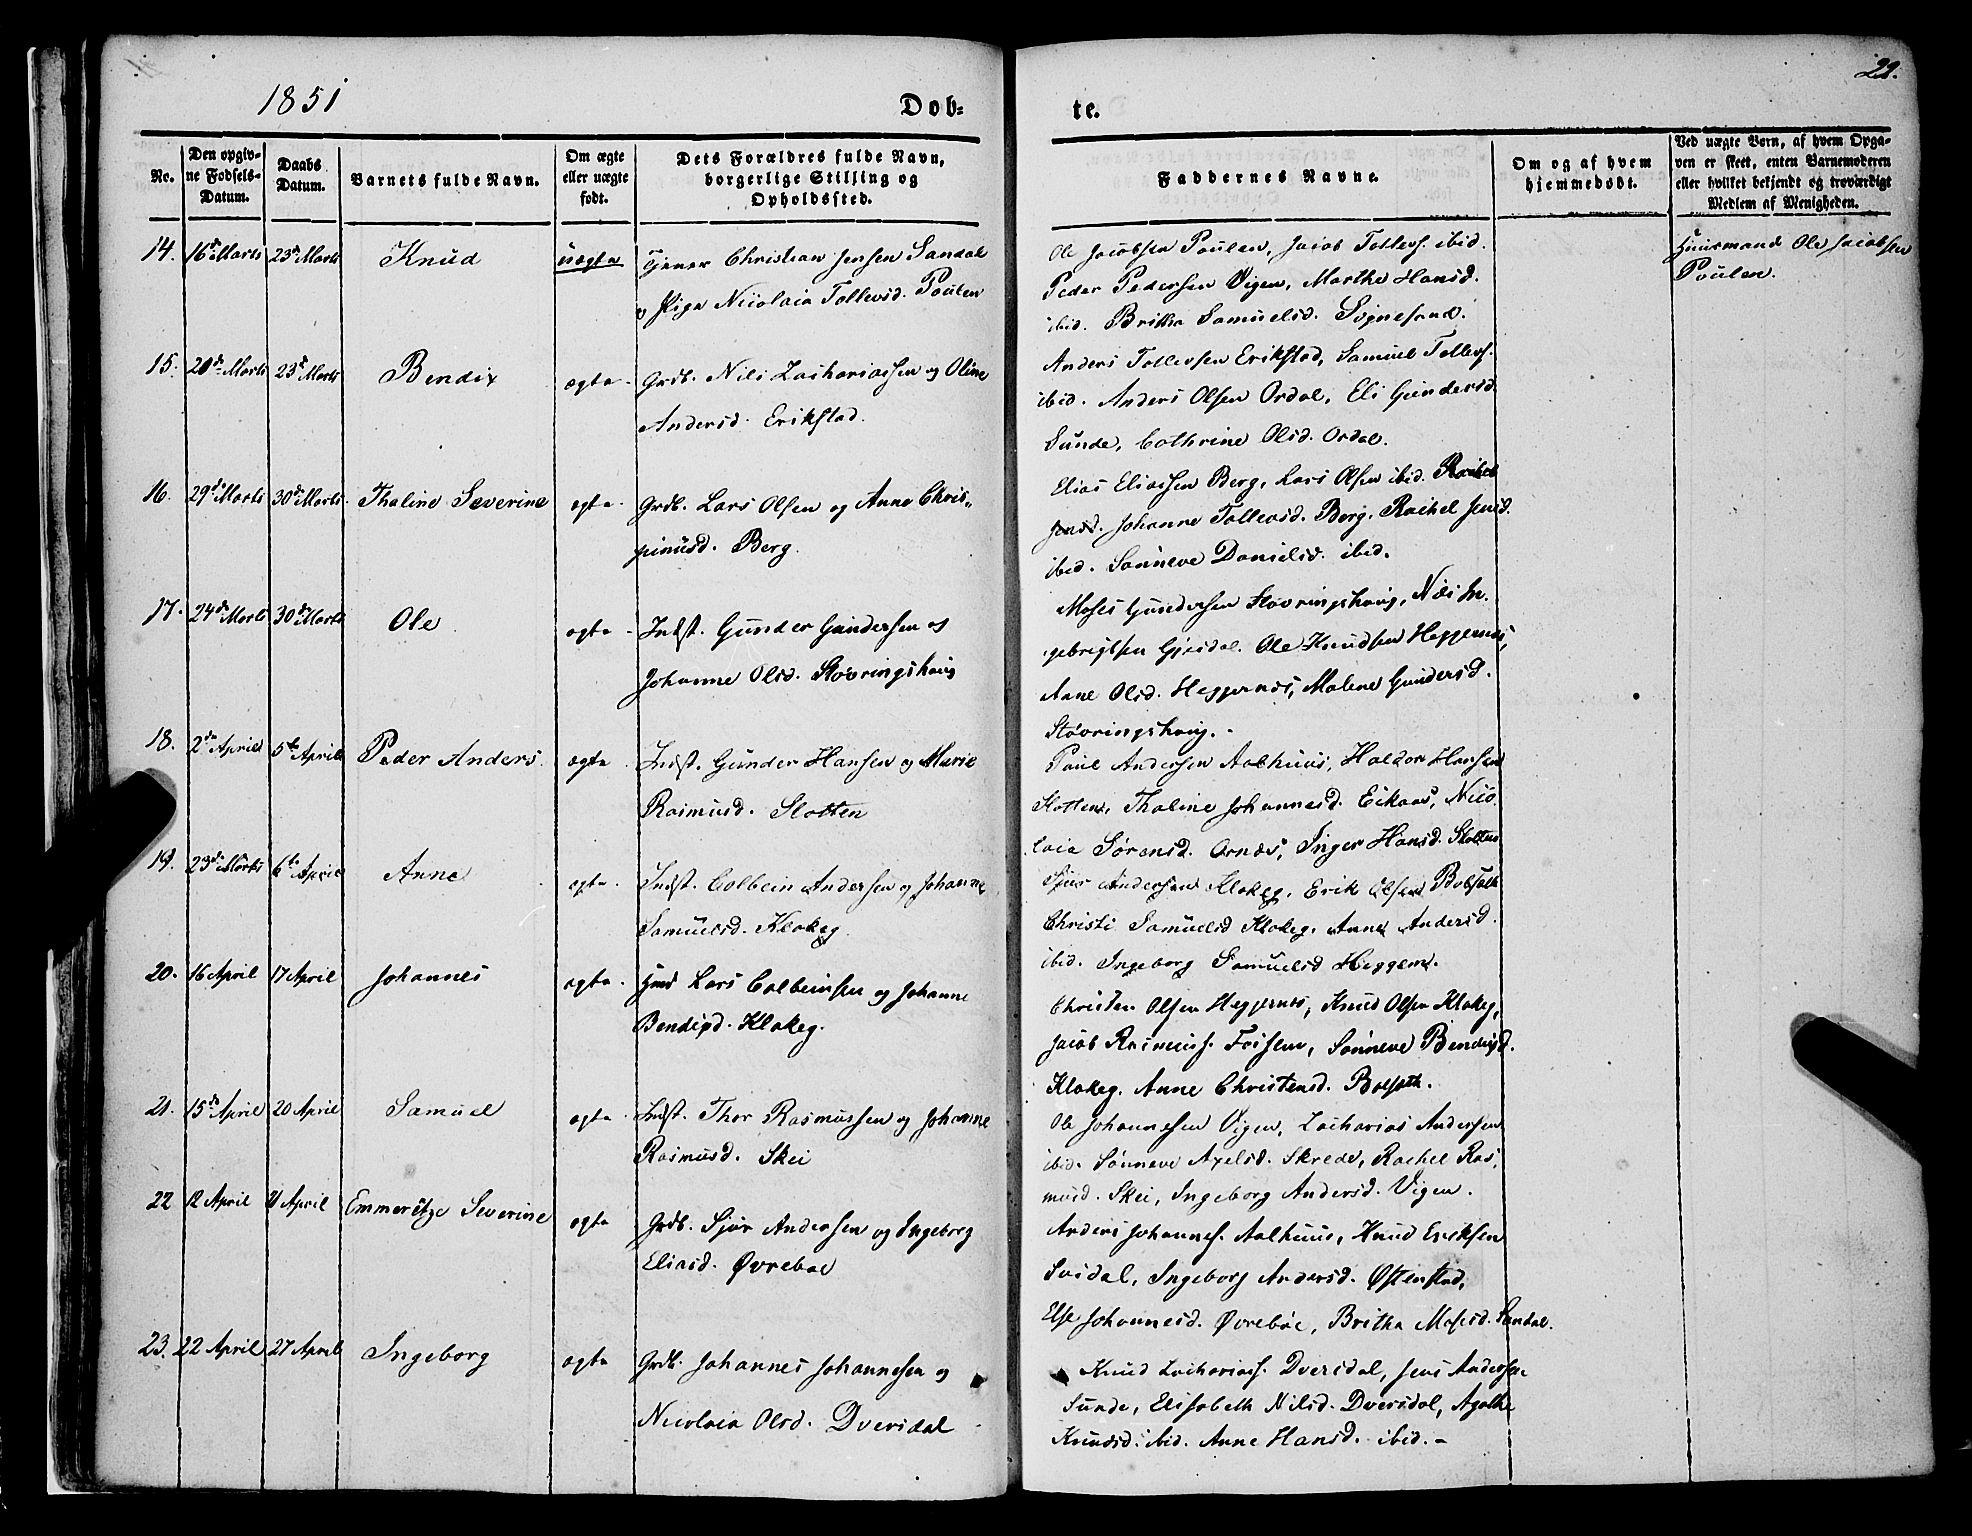 SAB, Jølster Sokneprestembete, H/Haa/Haaa/L0010: Parish register (official) no. A 10, 1847-1865, p. 22